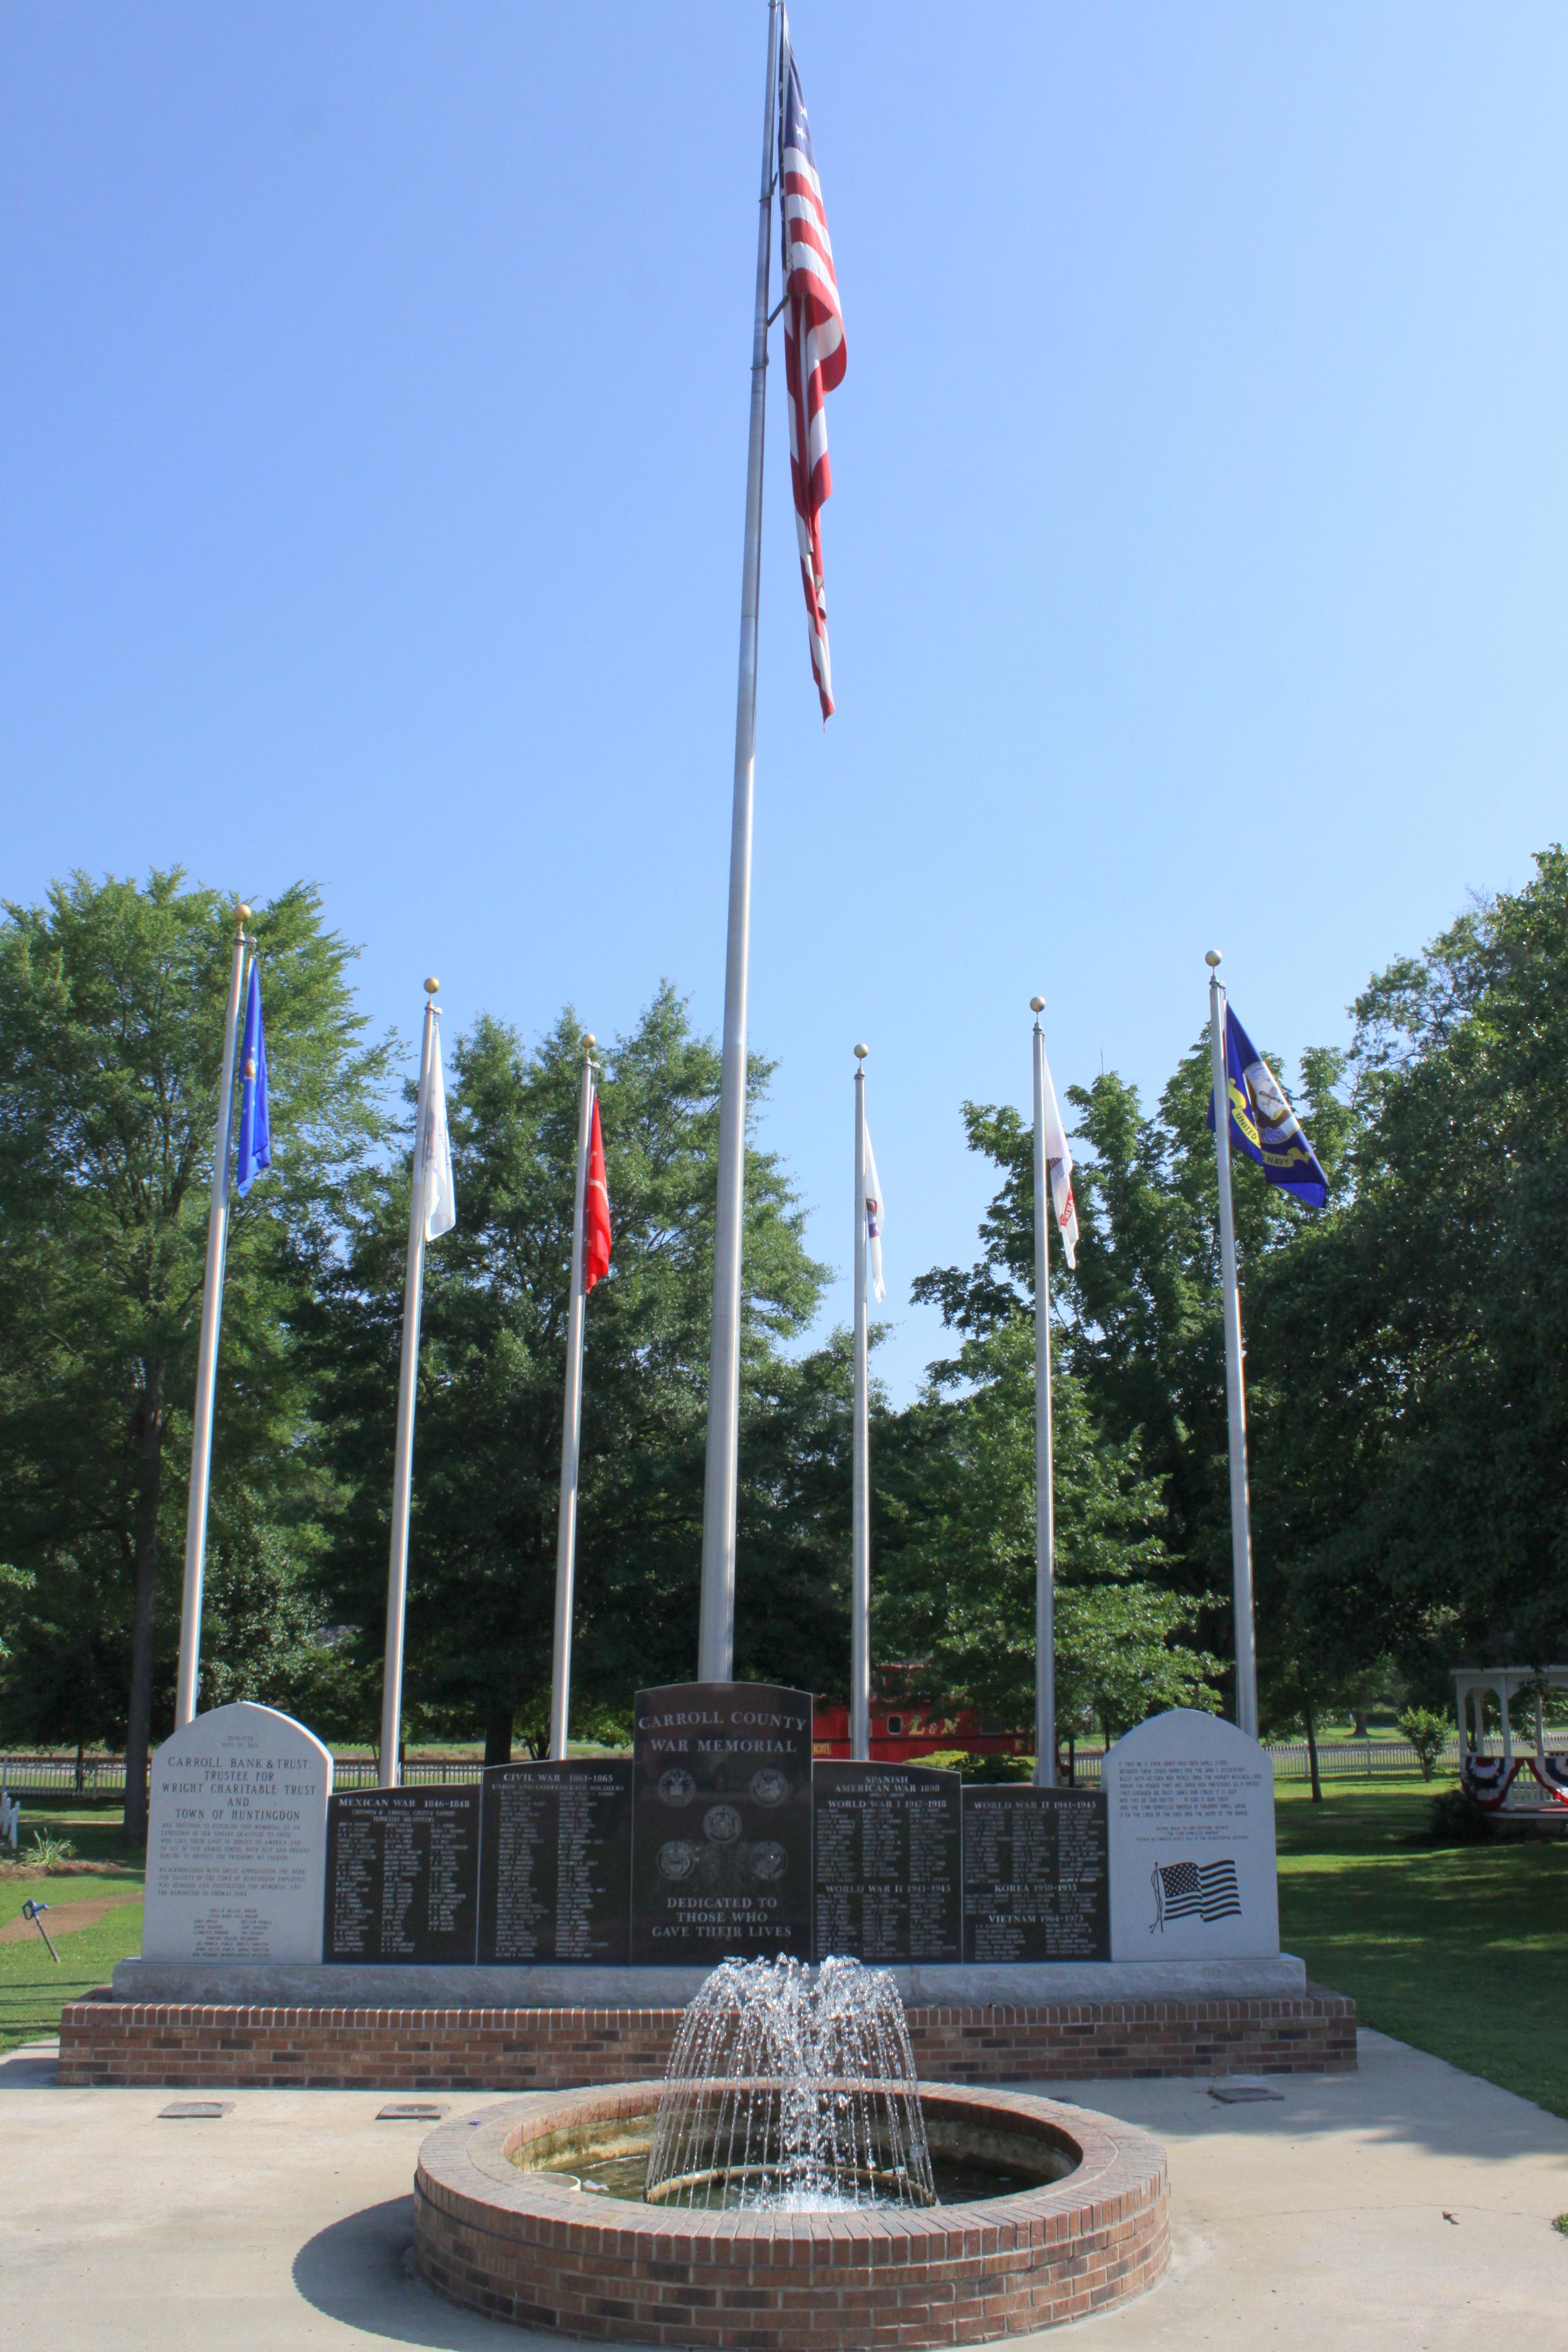 Tennessee carroll county clarksburg - Park Memorial Tn Tennessee Veterans Huntingdon Carrollcounty Thomaspark Bmok